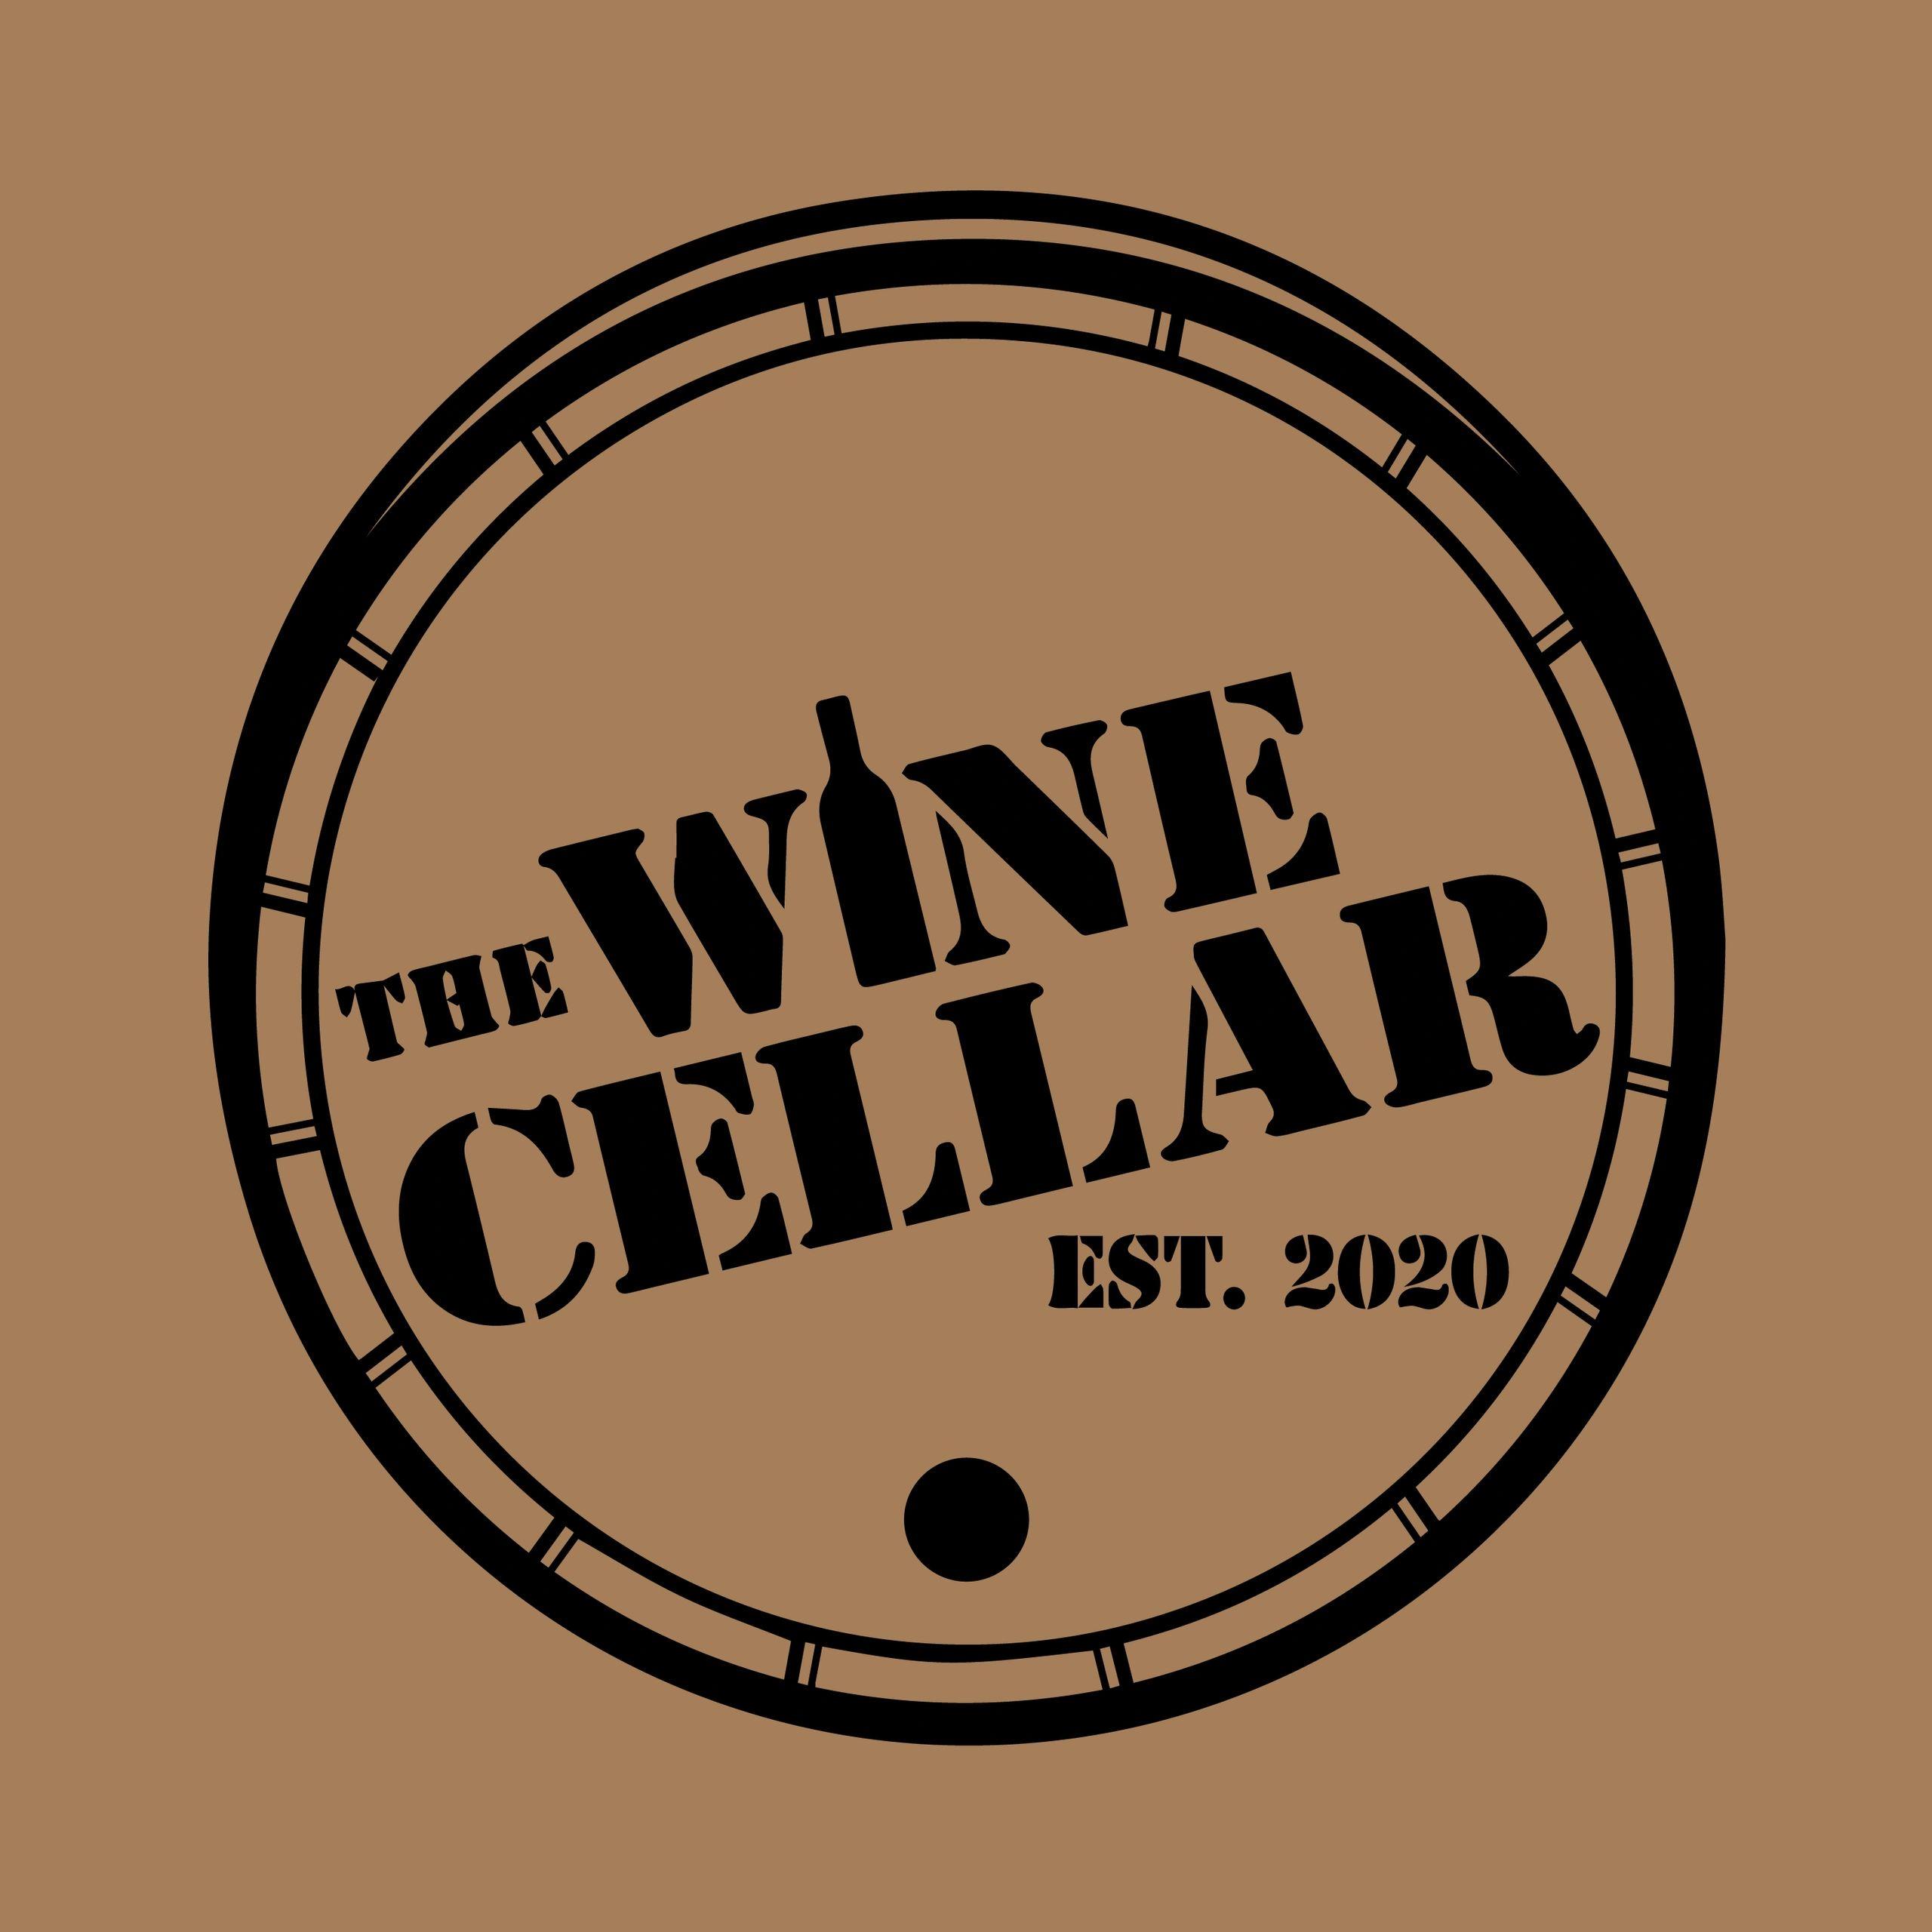 The Wine Cellar est. 2020 Logo